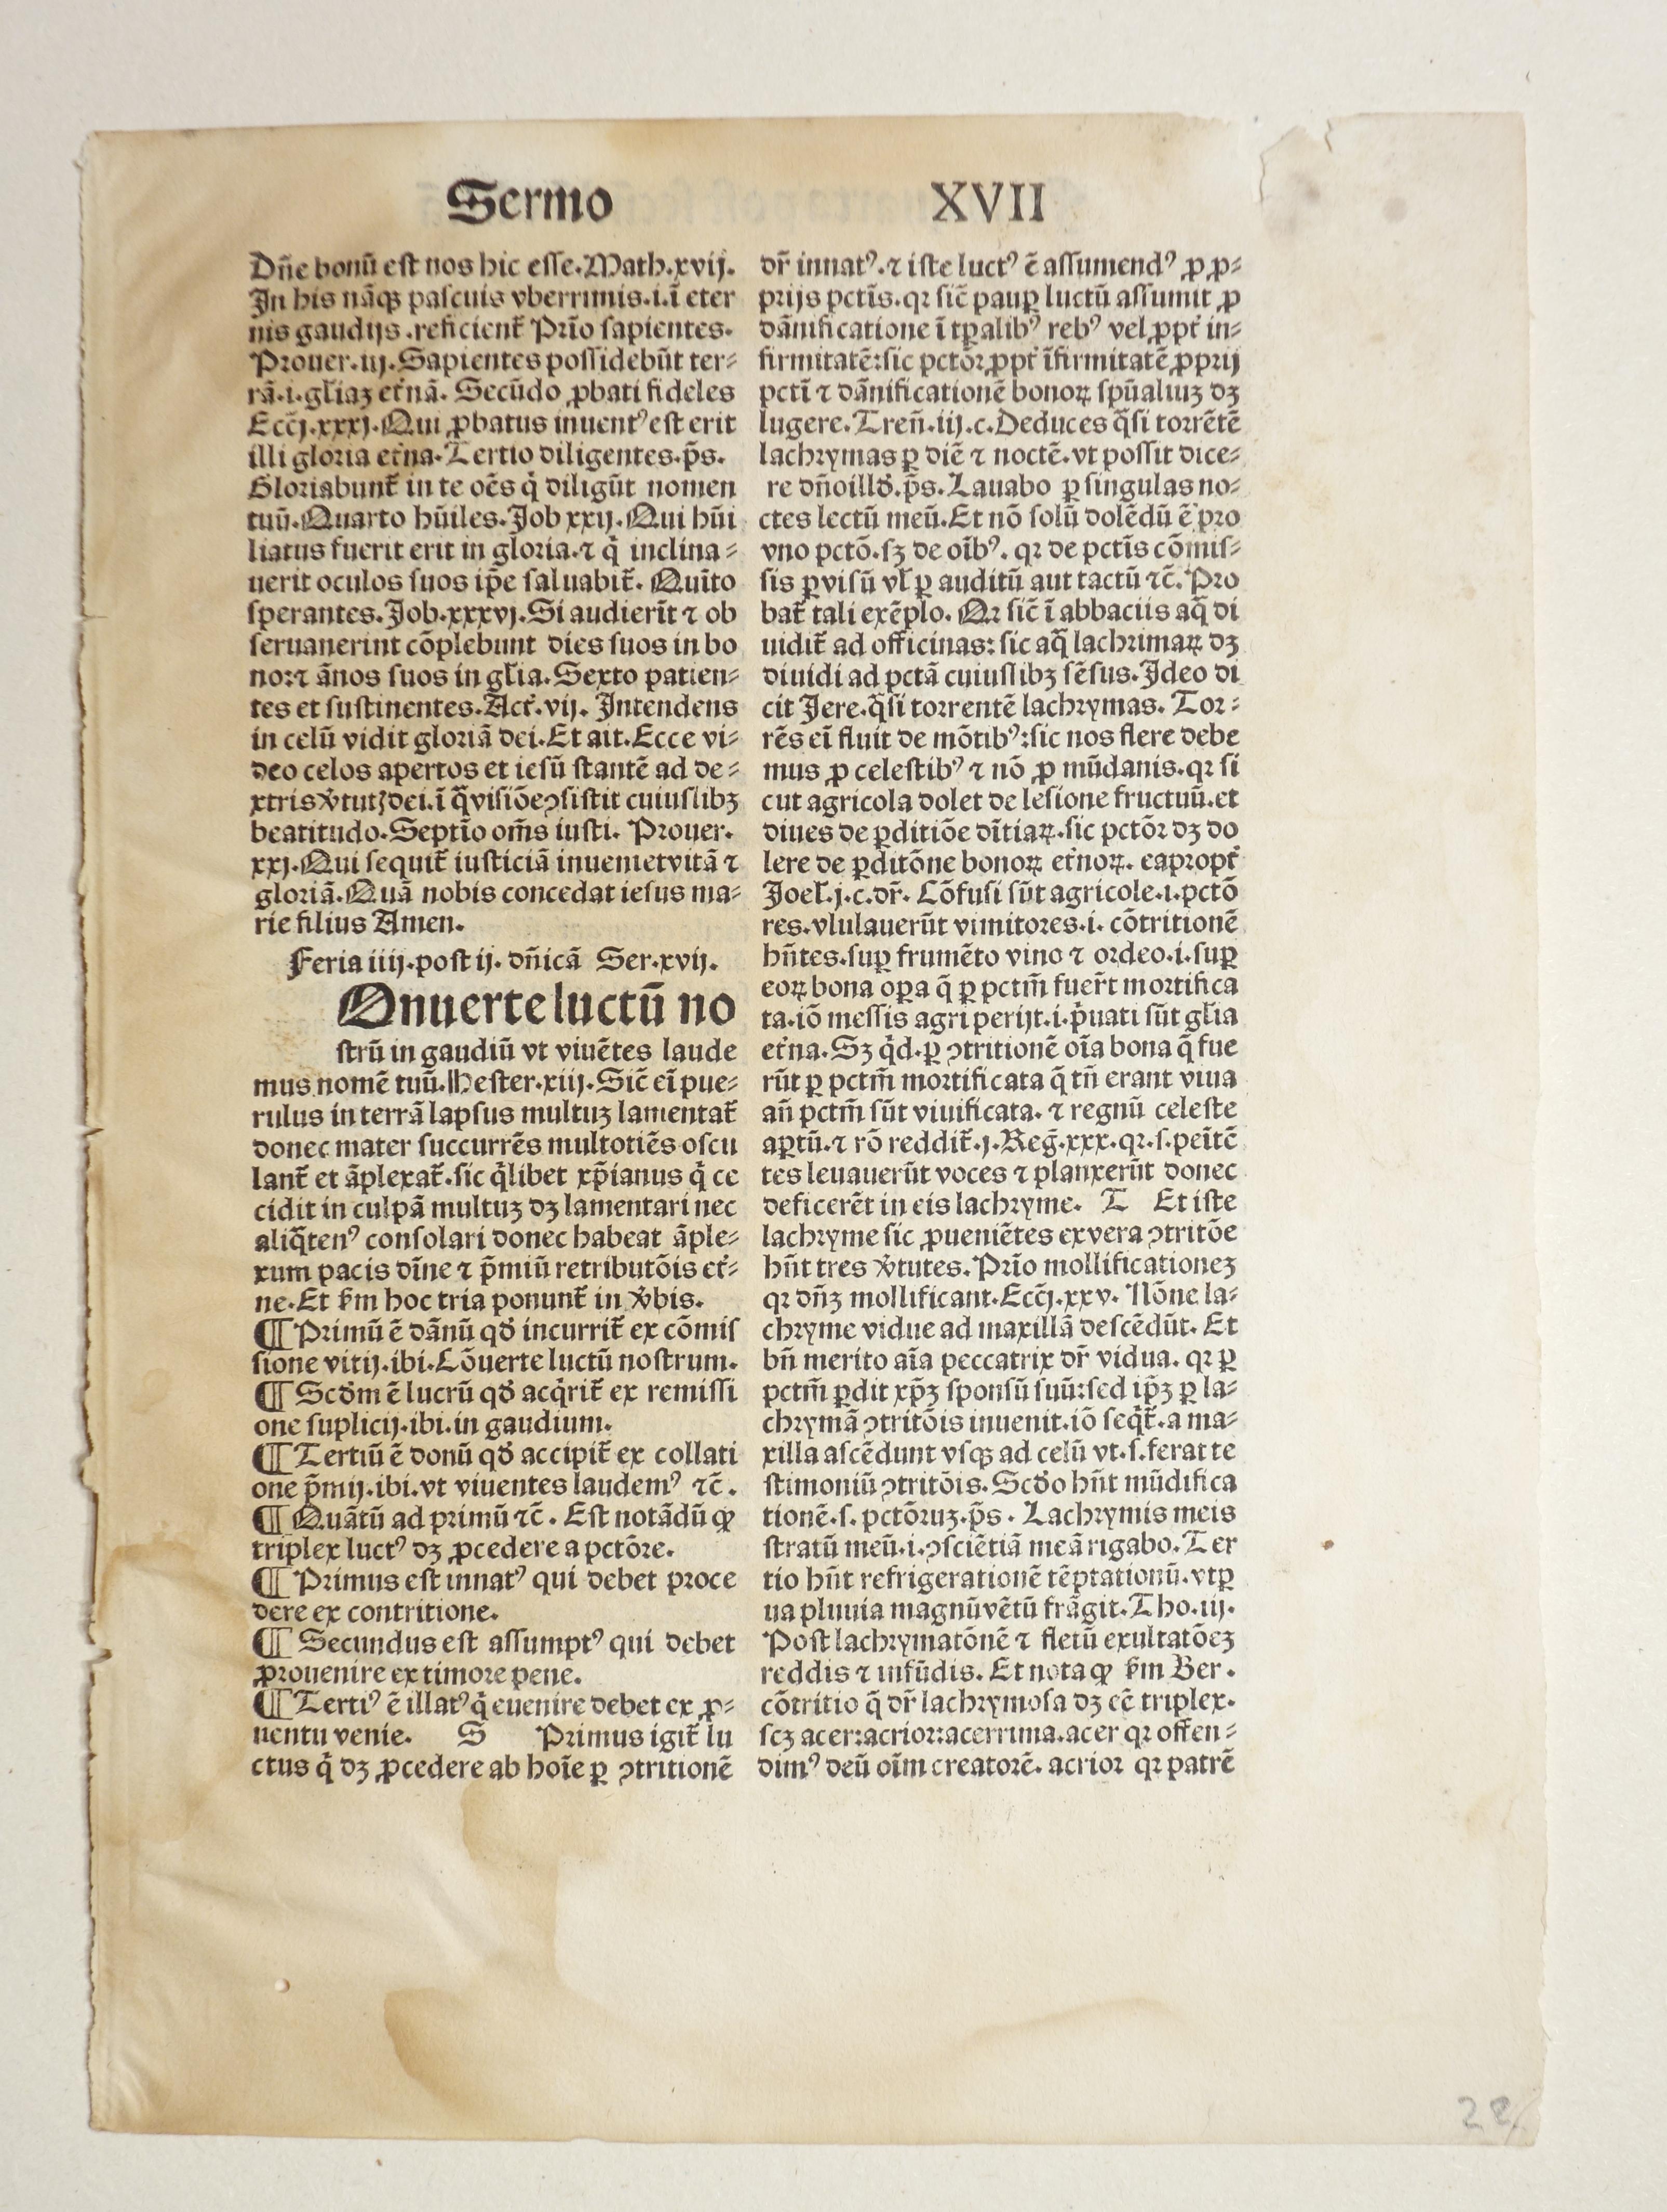 Quadragesimale super epistolas (GWM 28157, HC 13627).: Petrus de Orbellis: